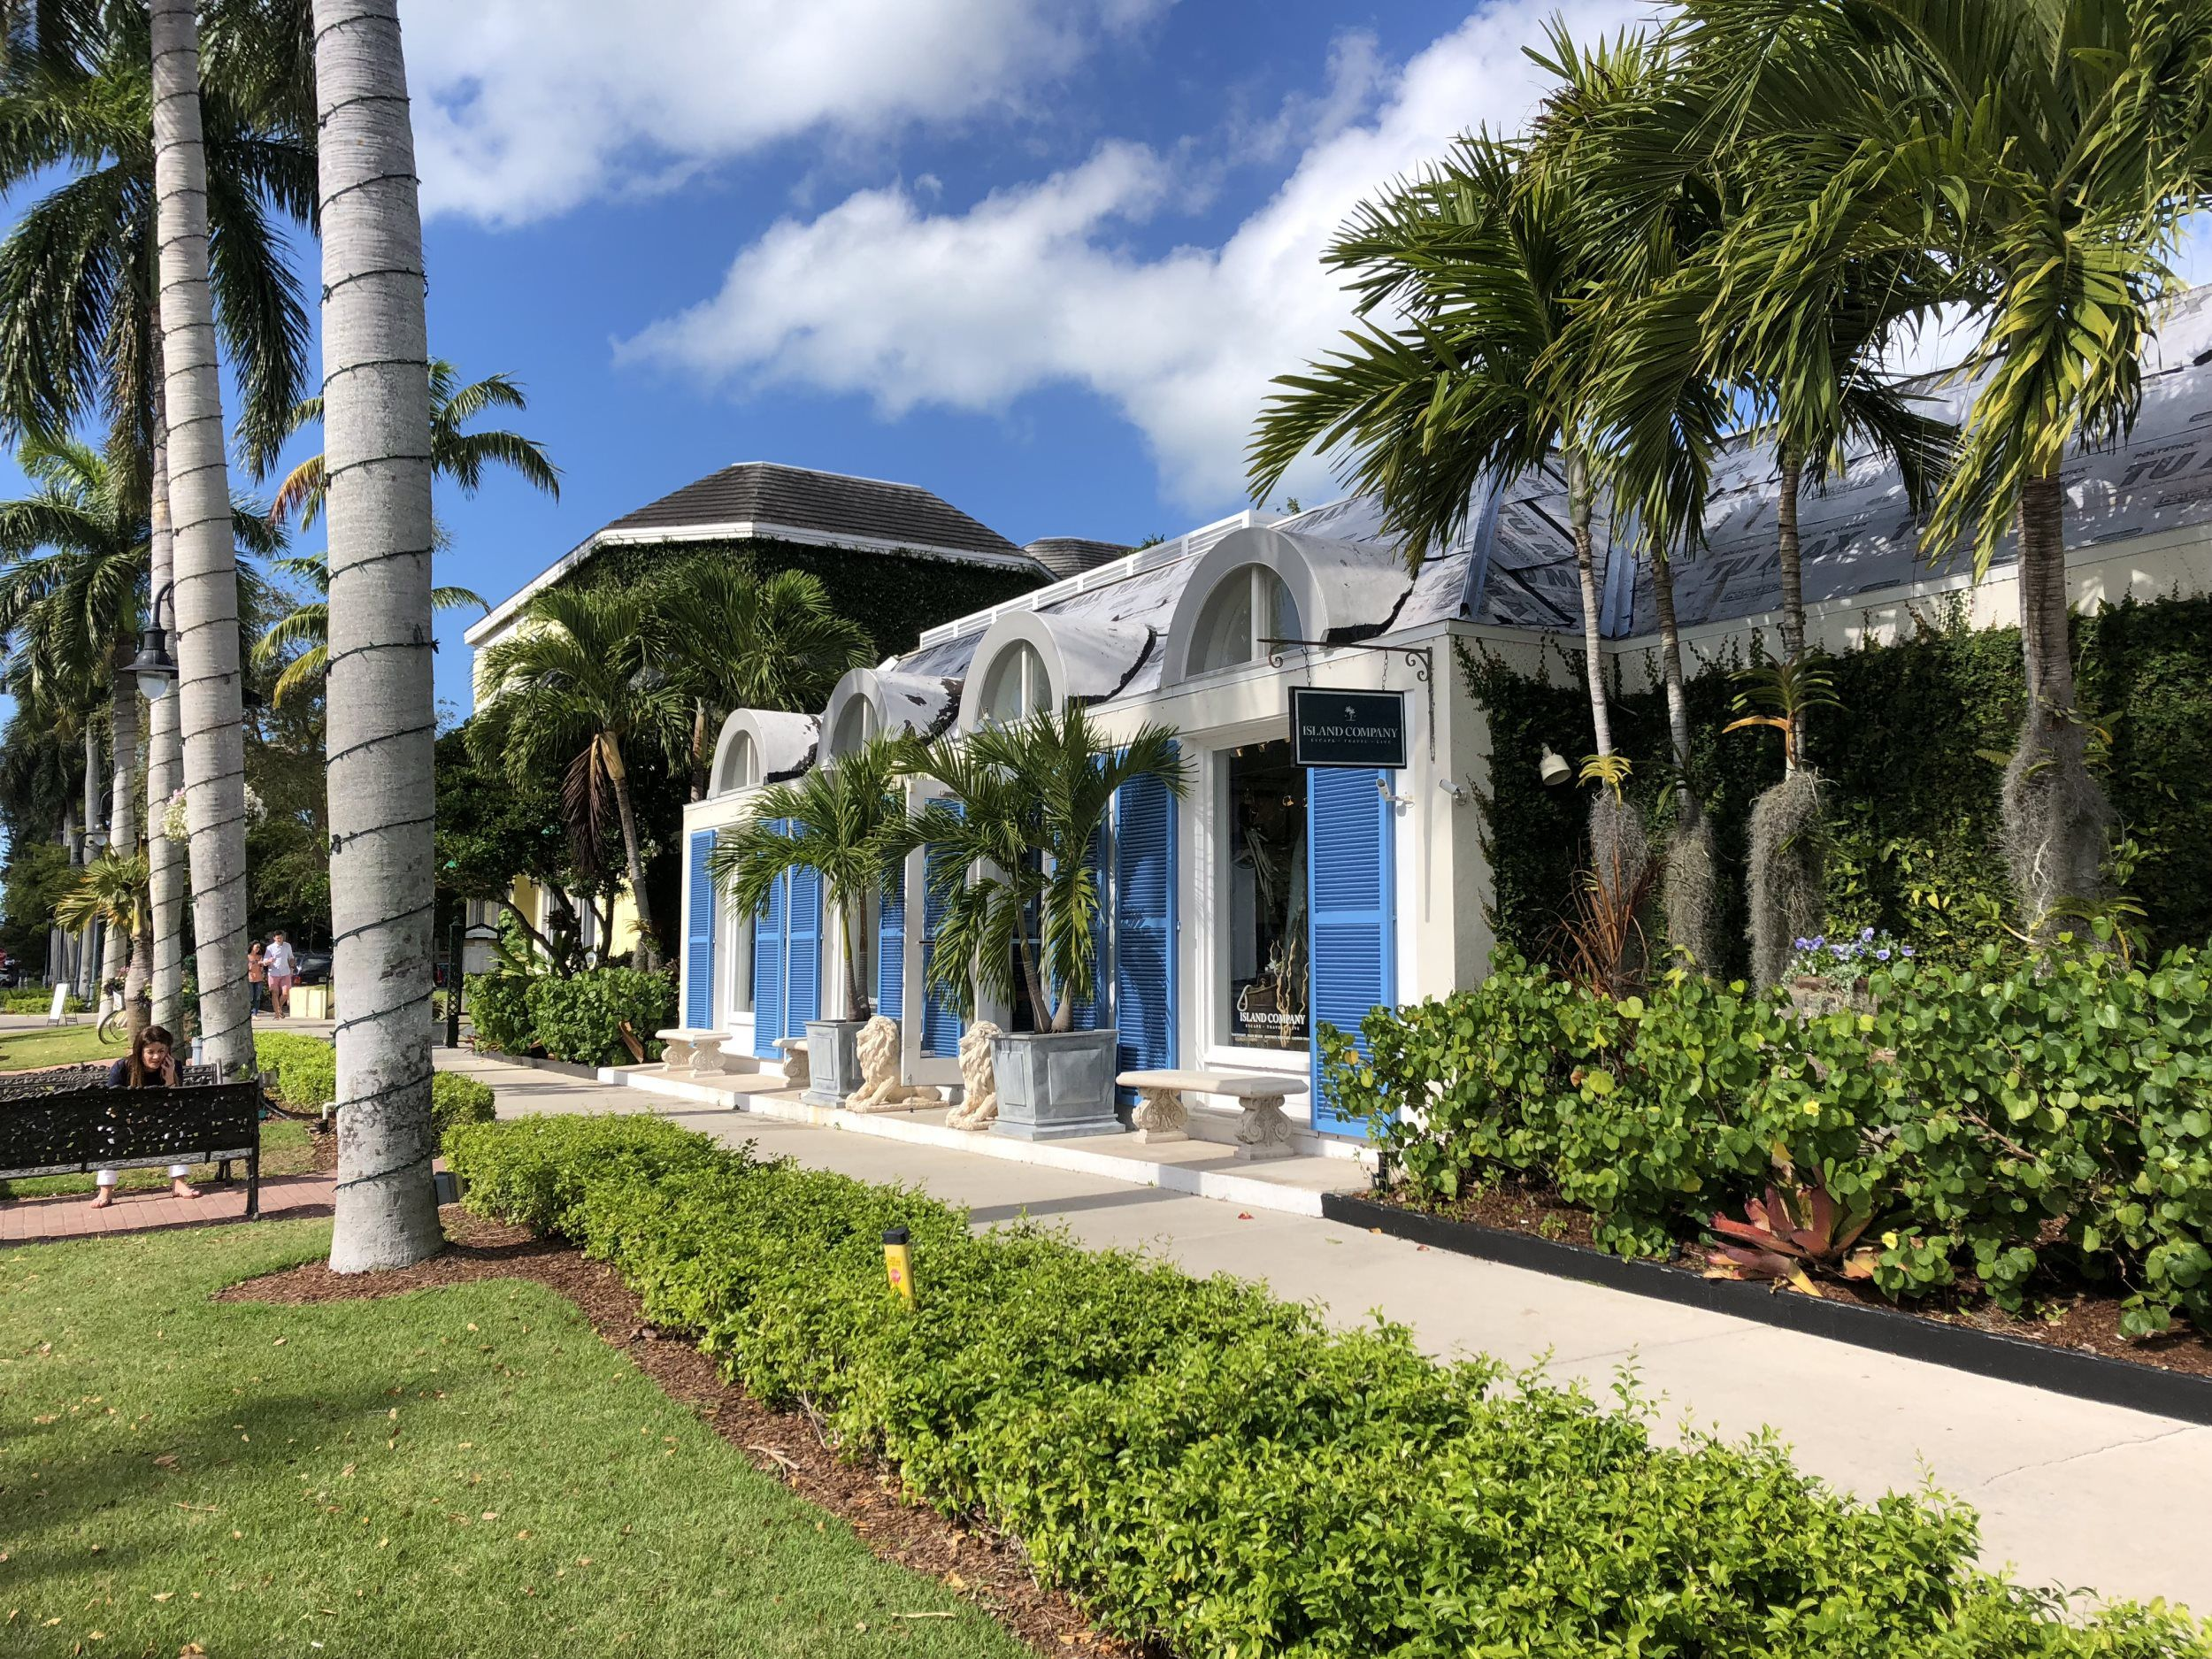 Real Estate Broker in Naples, Florida - John H. Mathews Realty